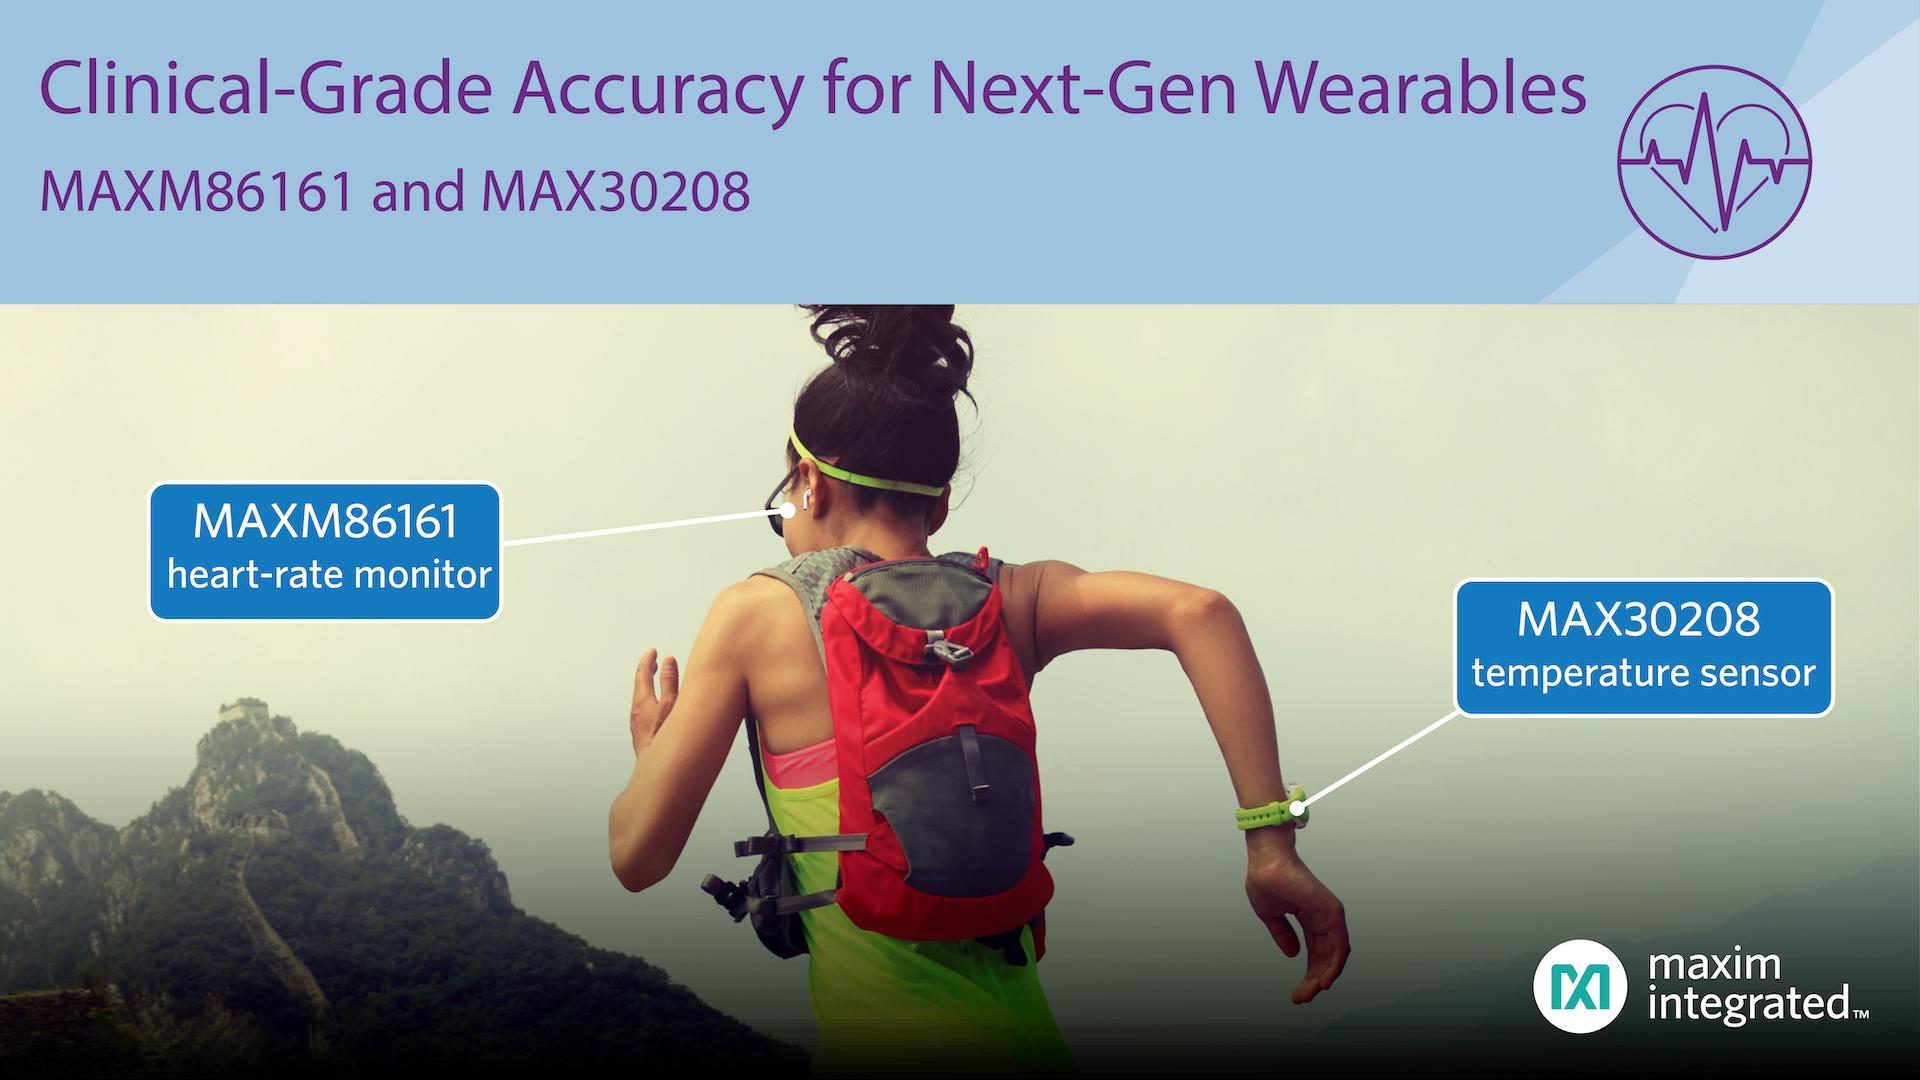 Maxim发布最新医用传感器,助力下一代可穿戴设备实现超小尺寸、最低功耗和临床级精度